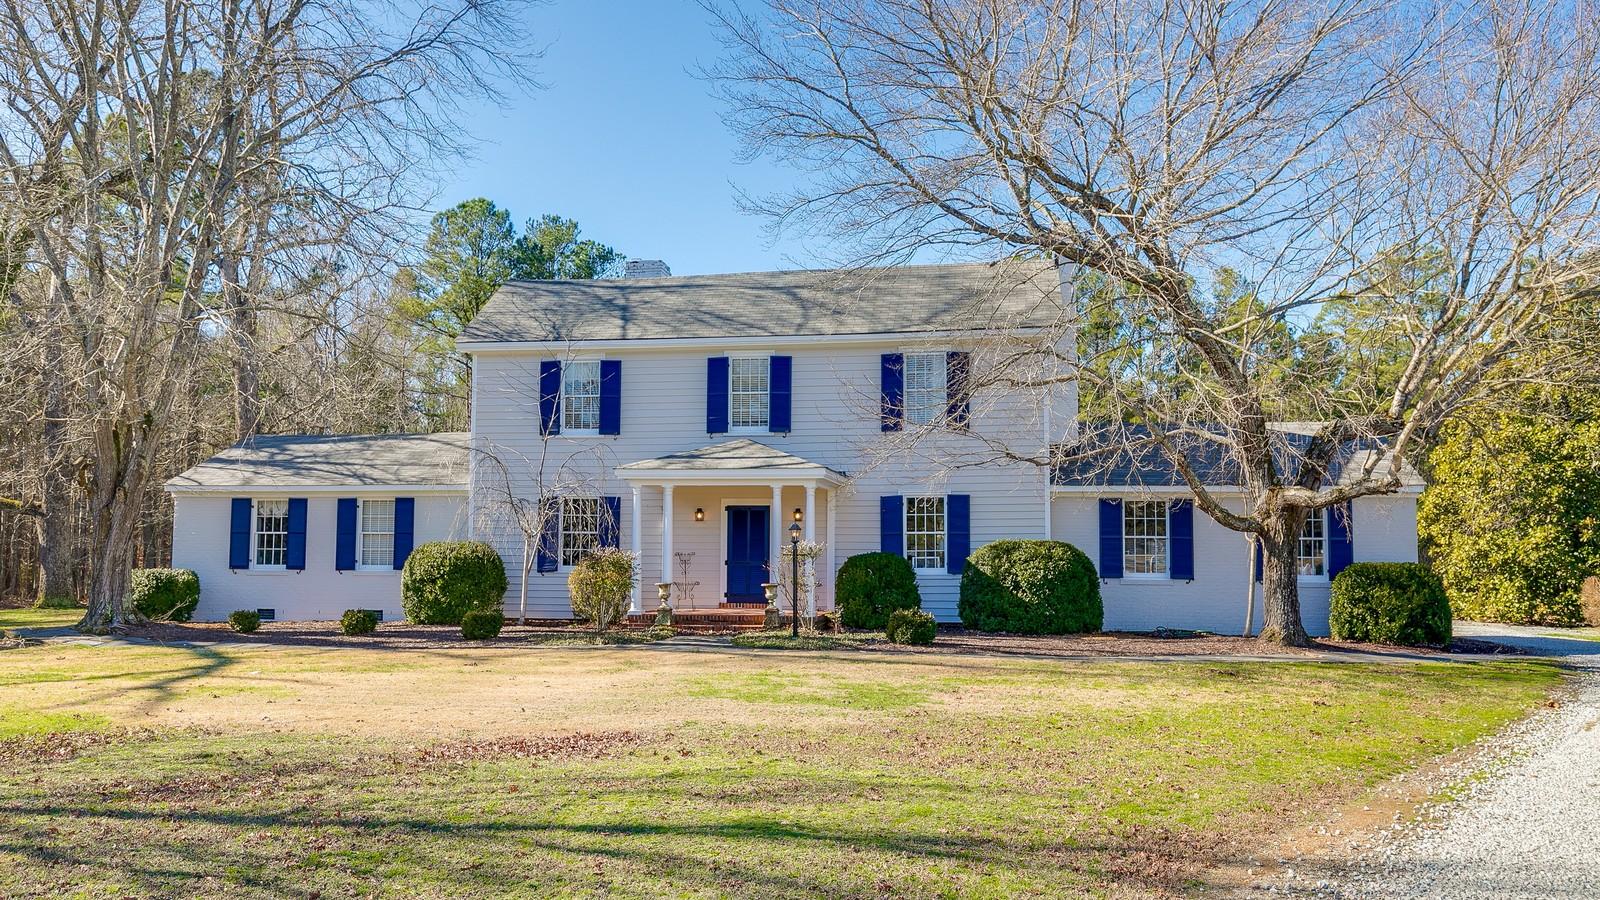 独户住宅 为 销售 在 Renovated 1890's Colonial Home on 17 acres. 10200 Taylor Rd 切斯特菲尔德, 弗吉尼亚州, 23838 美国